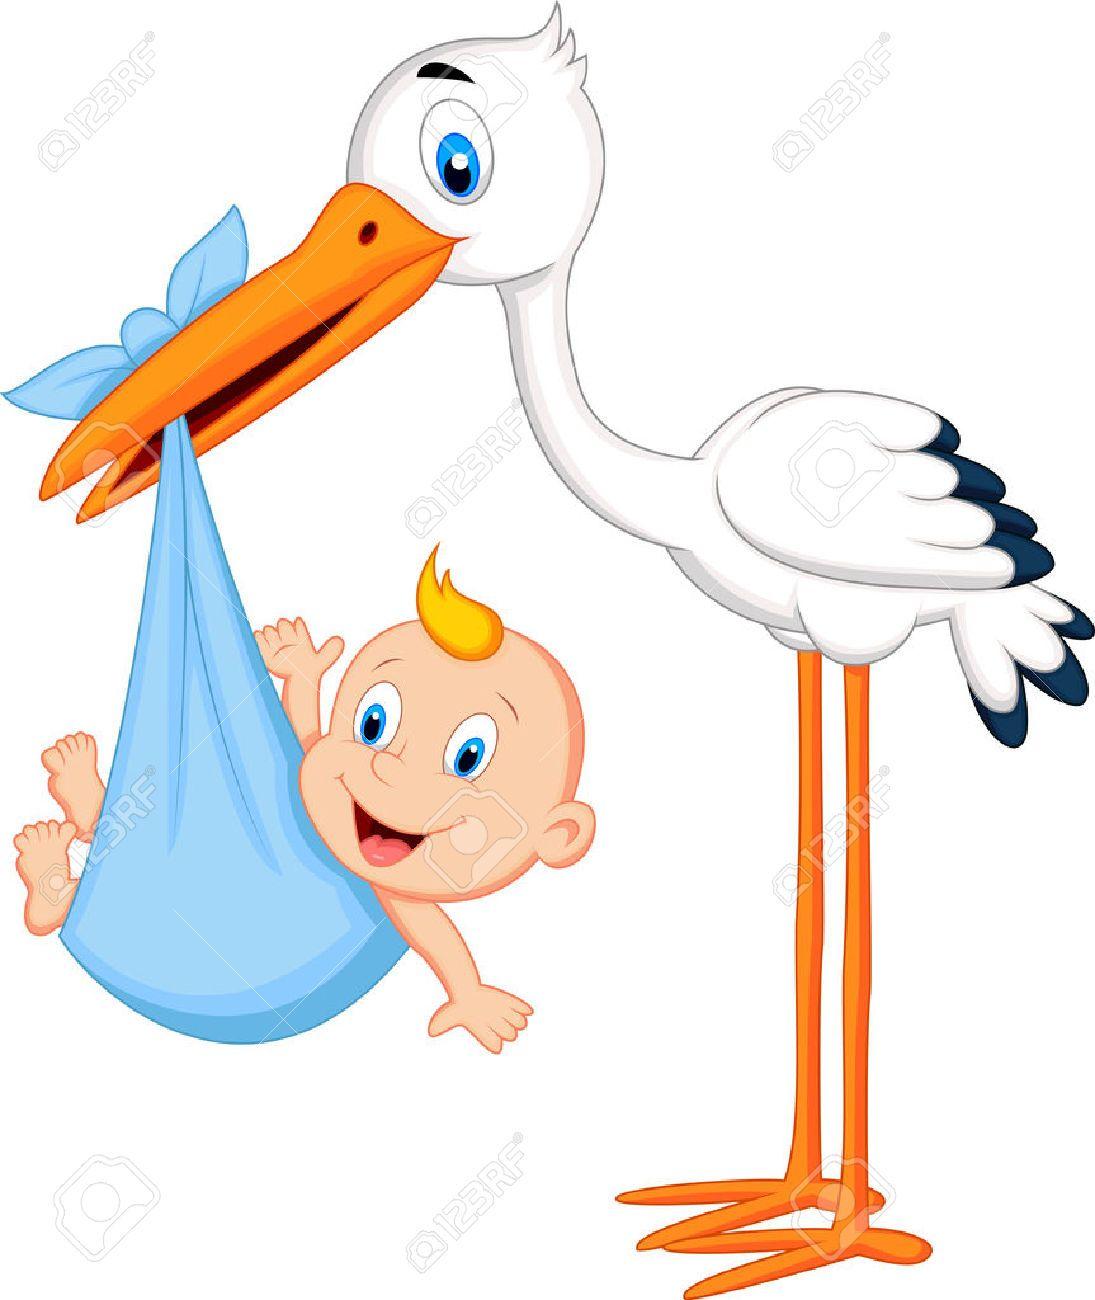 Cig e a de la historieta que lleva el beb ilustraciones - Immagini di cicogne che portano bambini ...